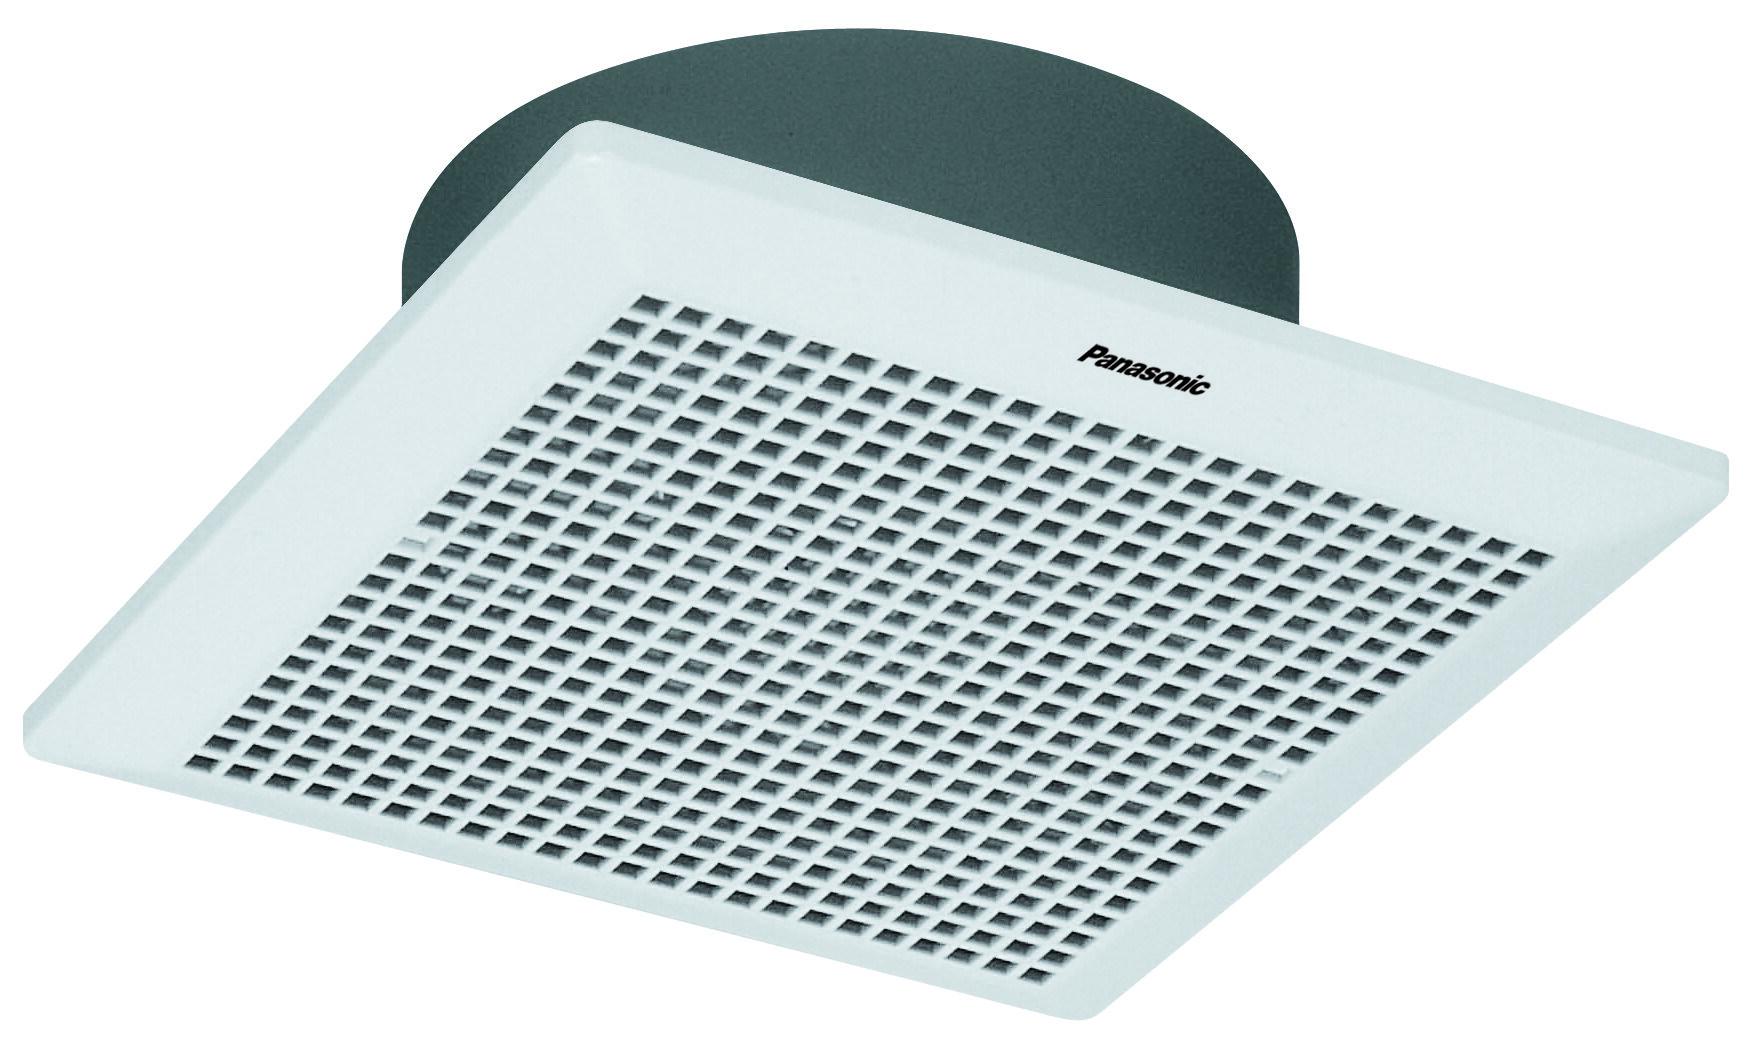 Panasonic FV 20CUT1 Ceiling Mount Ventilation Fan. Panasonic Ventilation Fans price in Malaysia   Best Panasonic